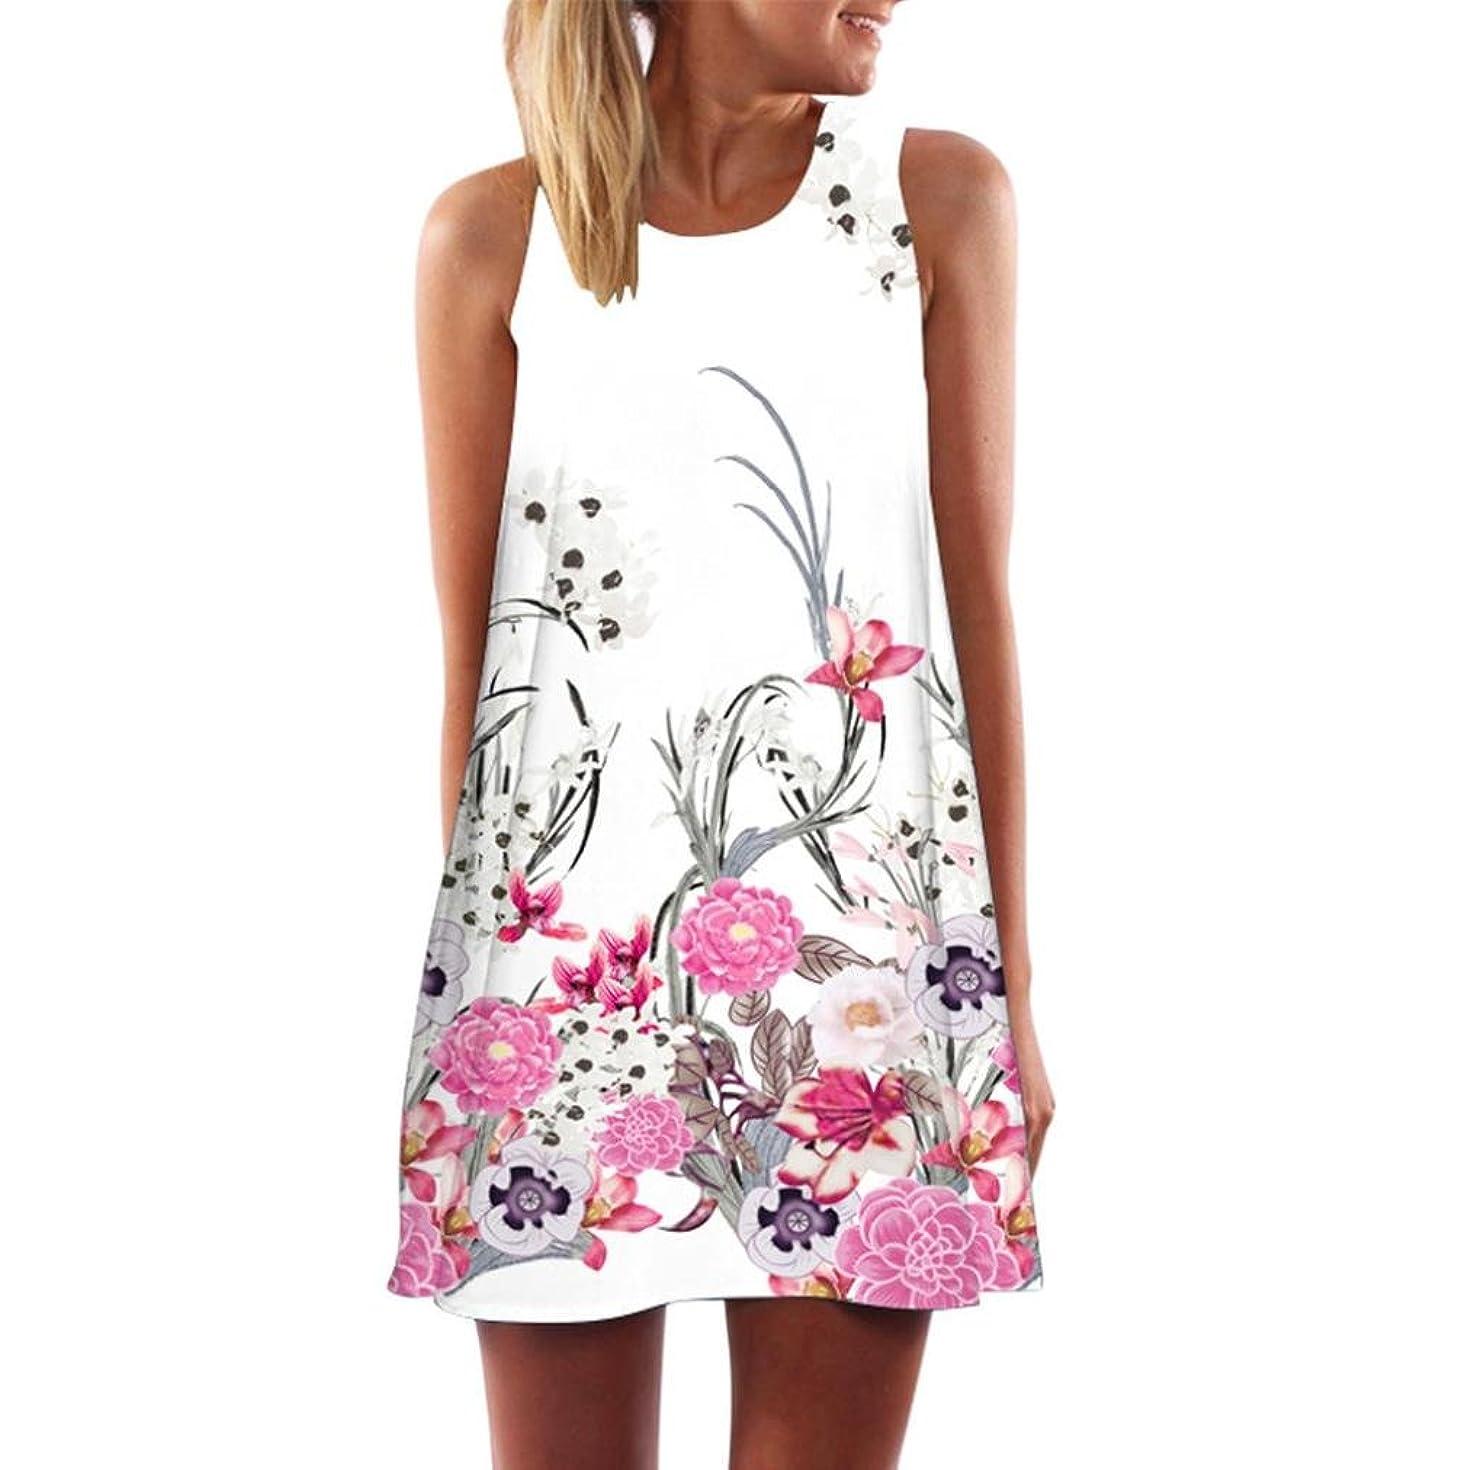 Vintage Boho Women Mini Dress Floral Printing Beach Sundress Summer Sleeveless Short Dress